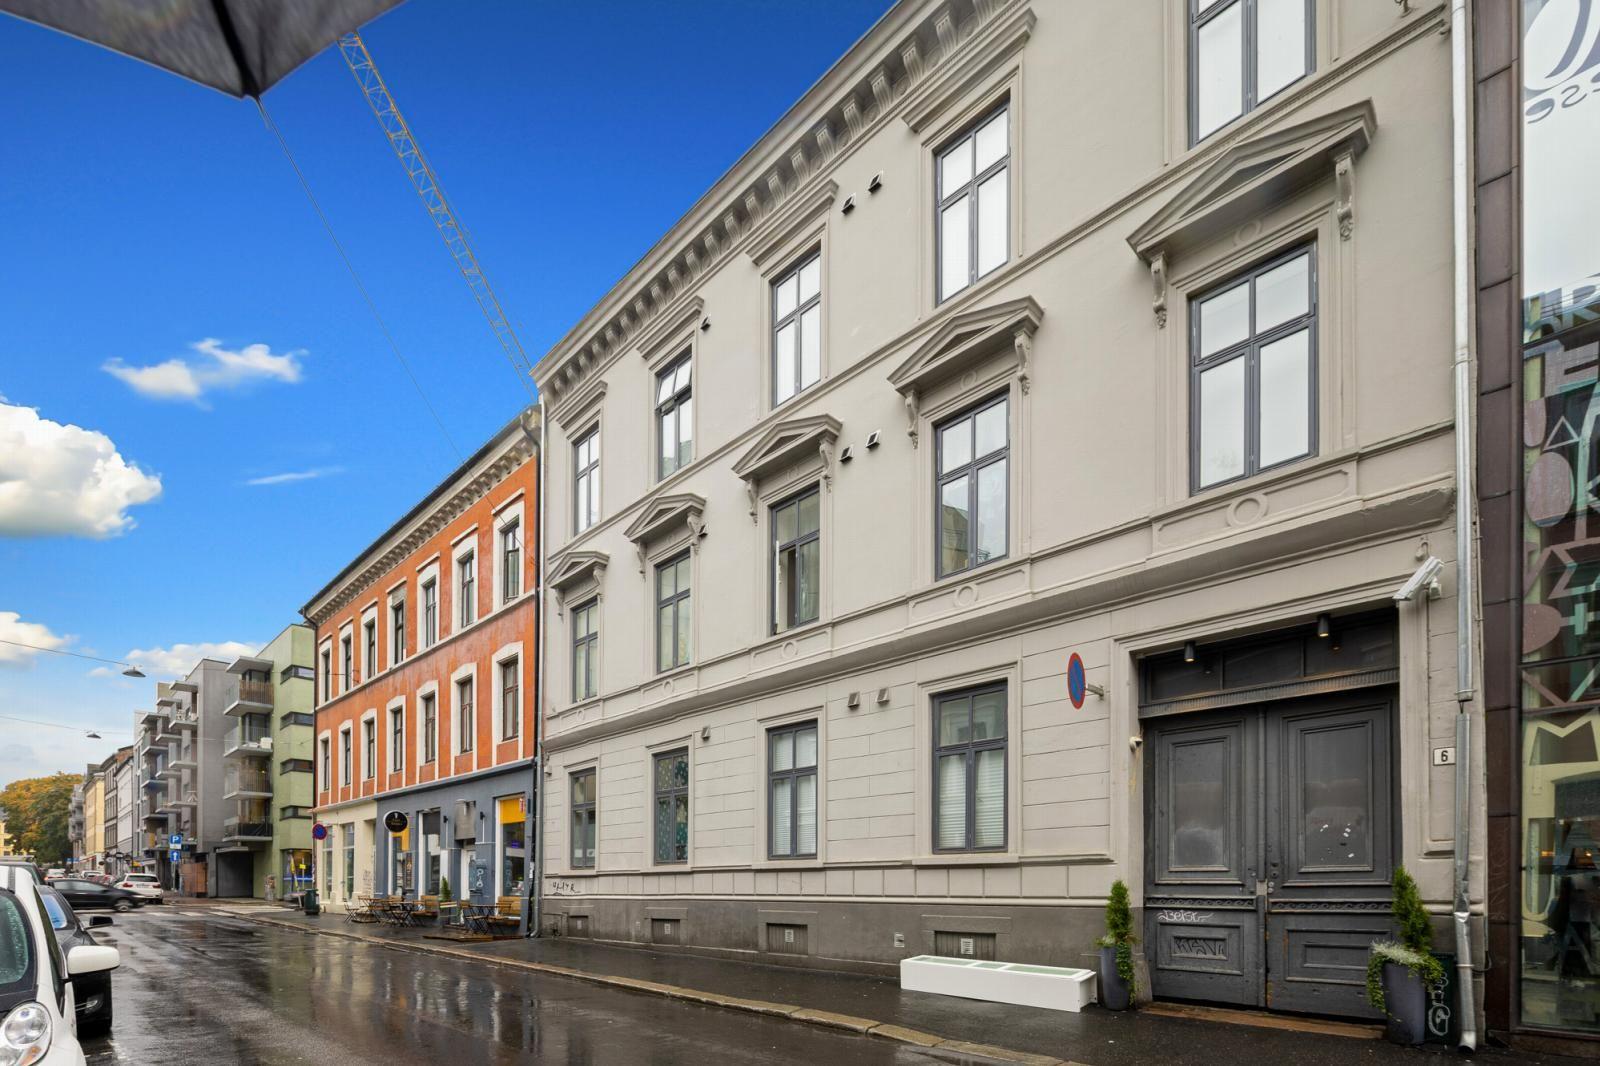 Osterhaus' gate 6A Fasade